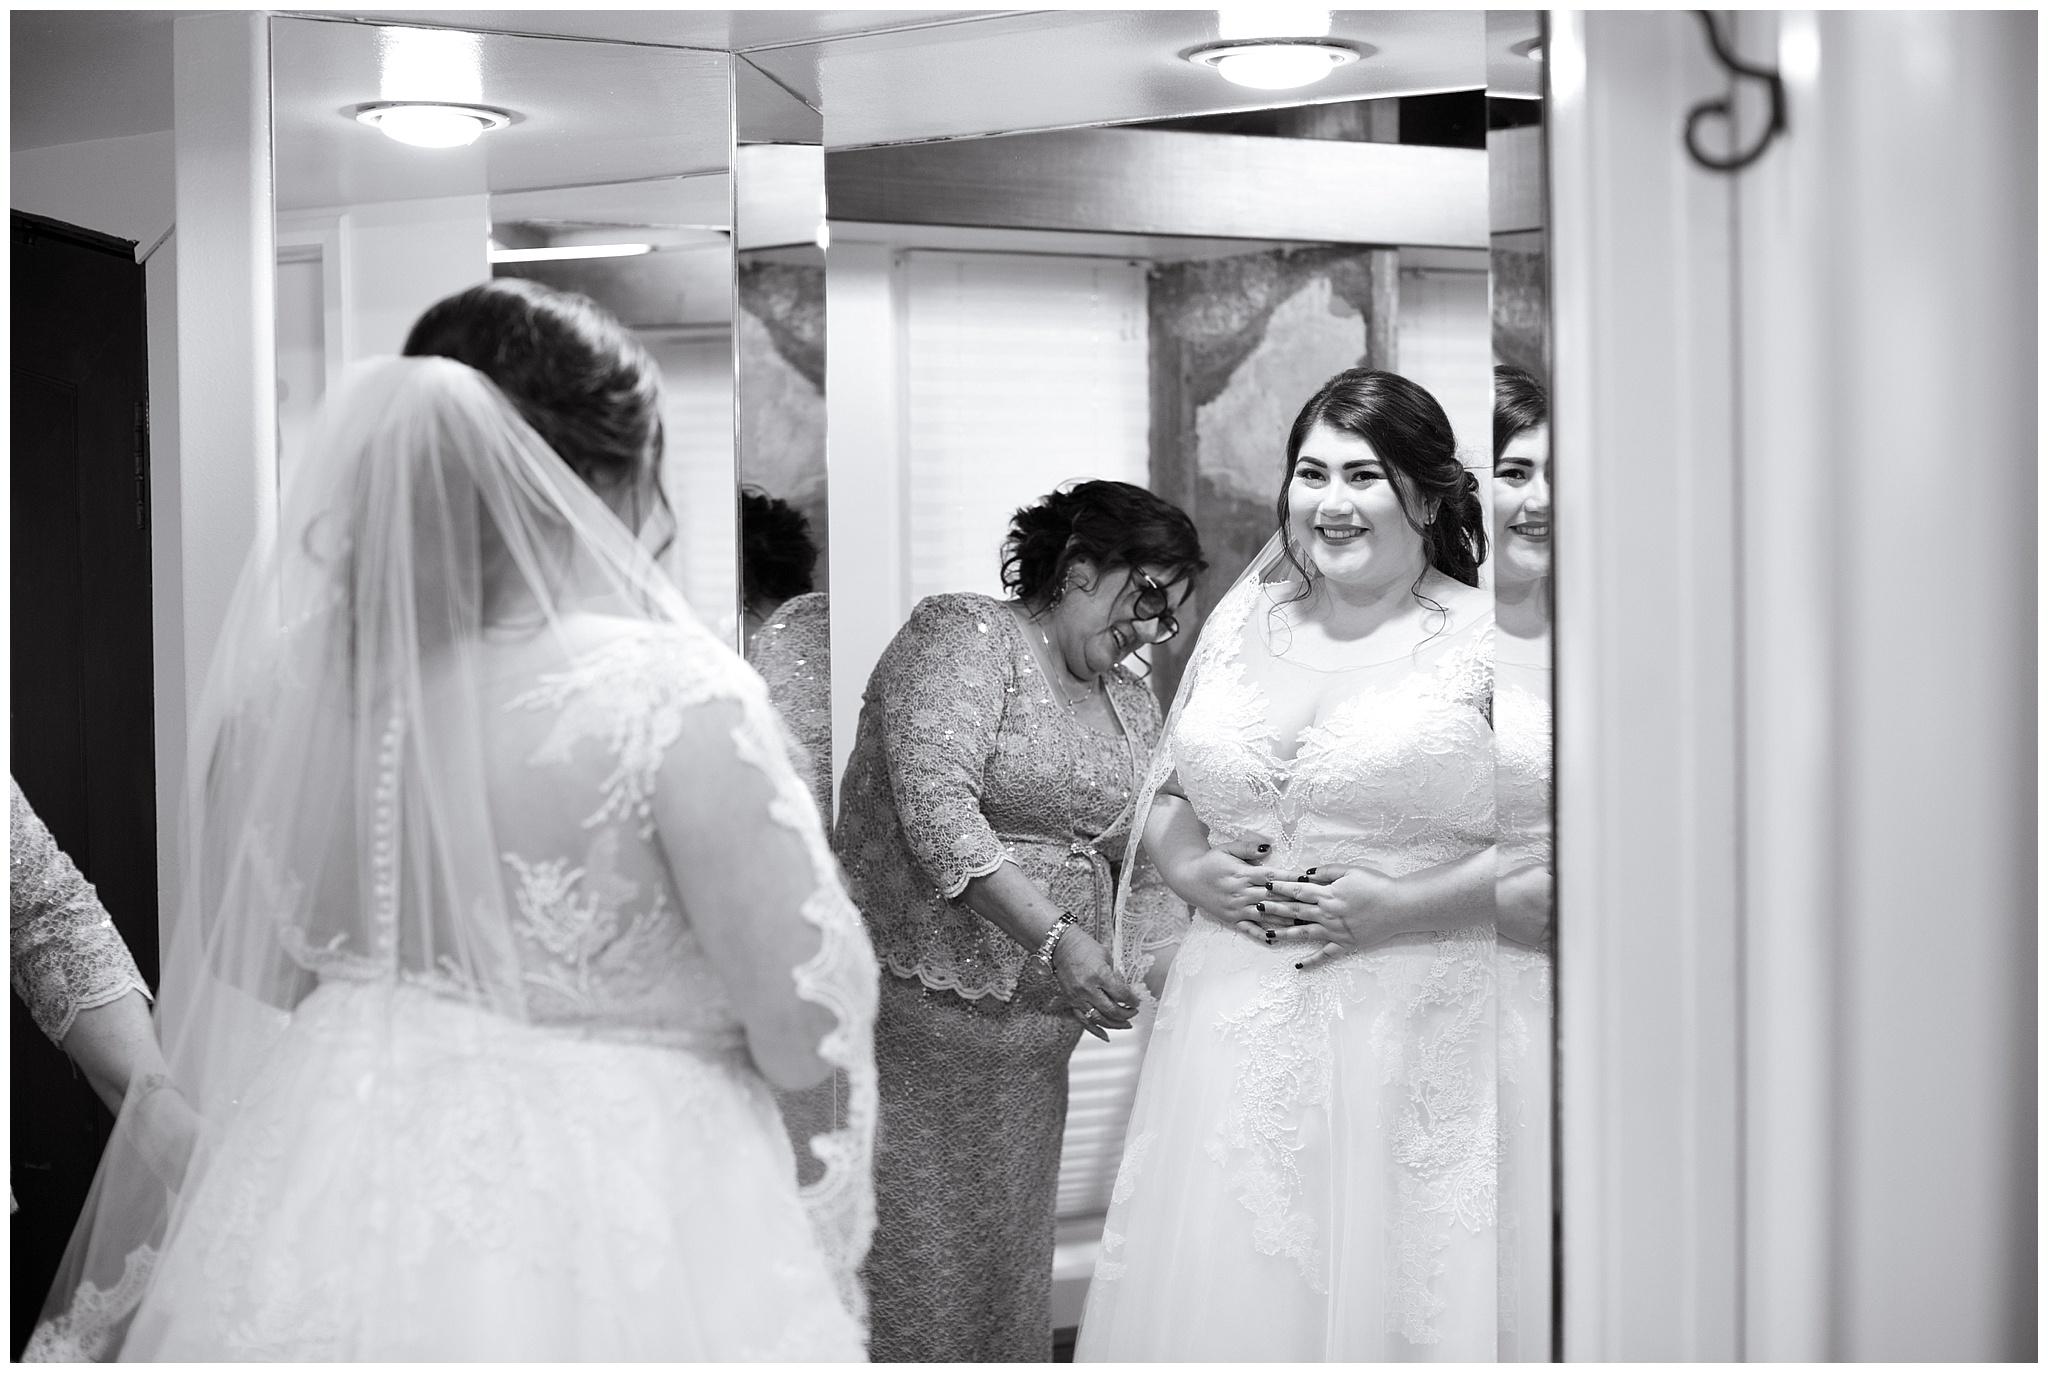 Carol_and_Grant_Wedding_3-3-18-7843-2.jpg